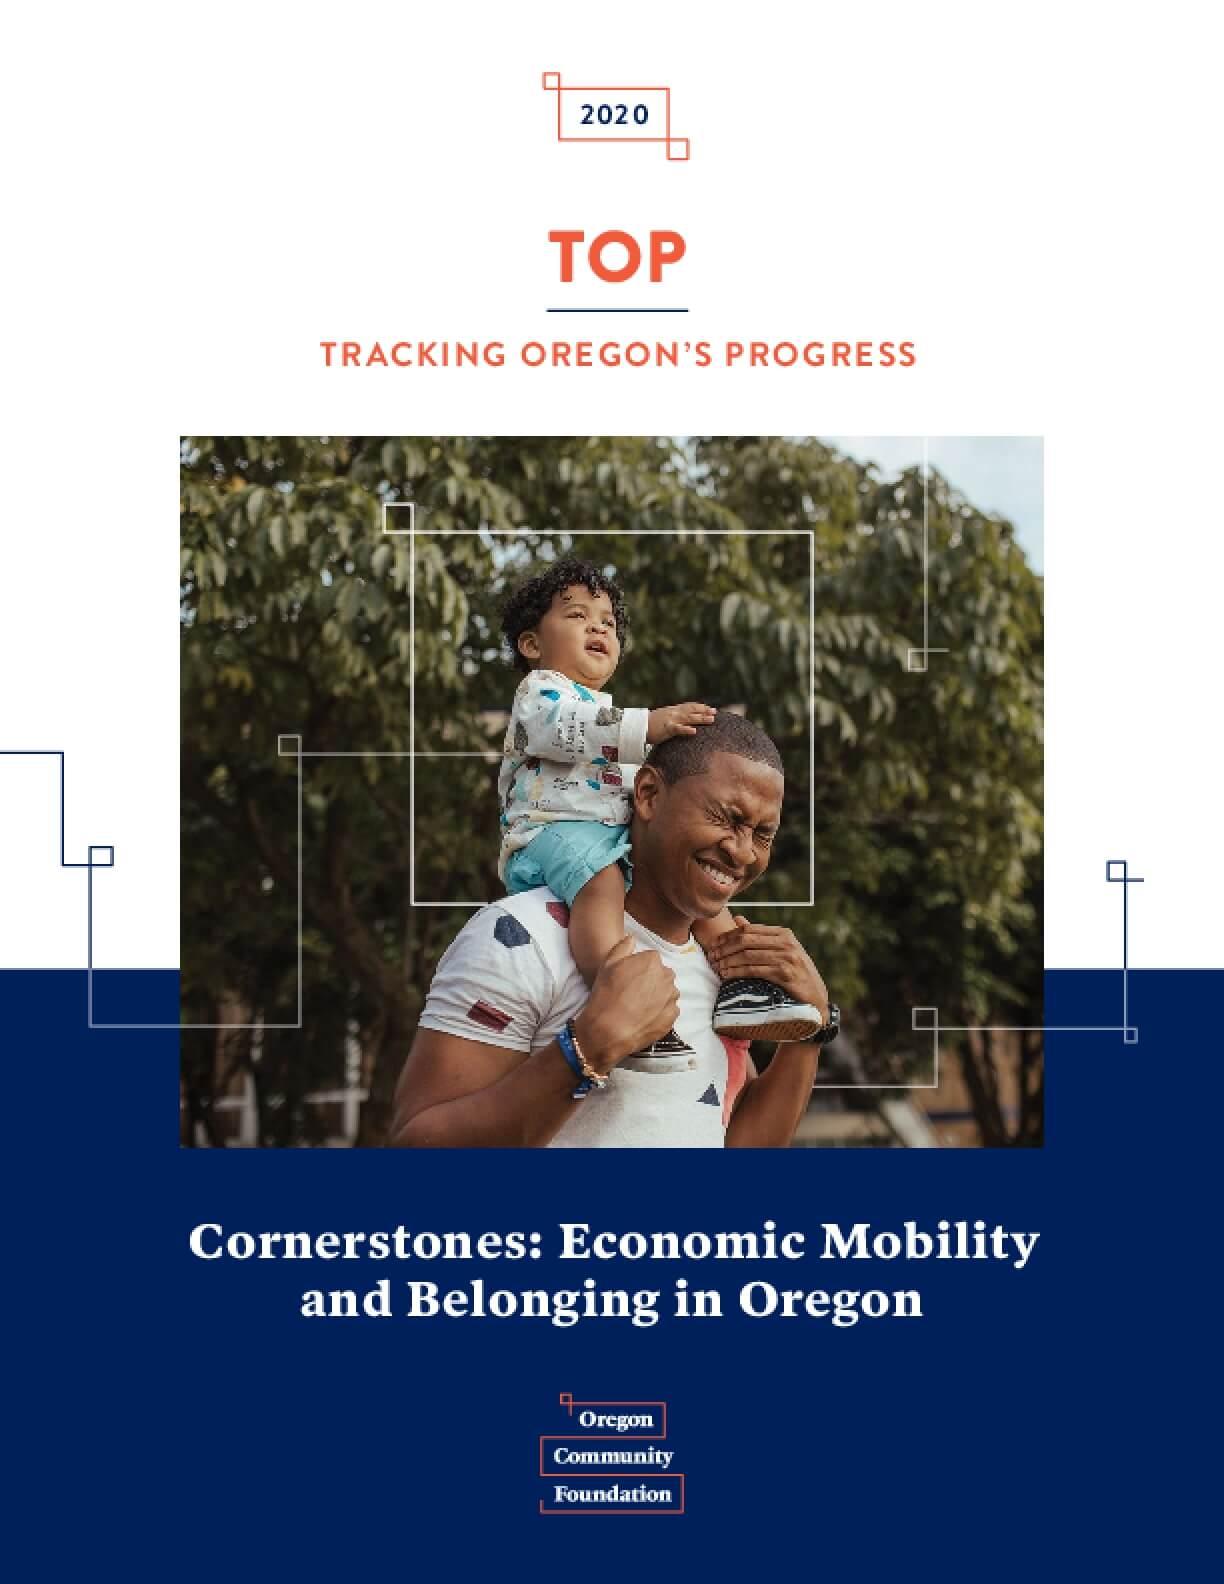 TOP (Tracking Oregon's Progress) Report 2020: Cornerstones: Economic Mobility and Belonging in Oregon